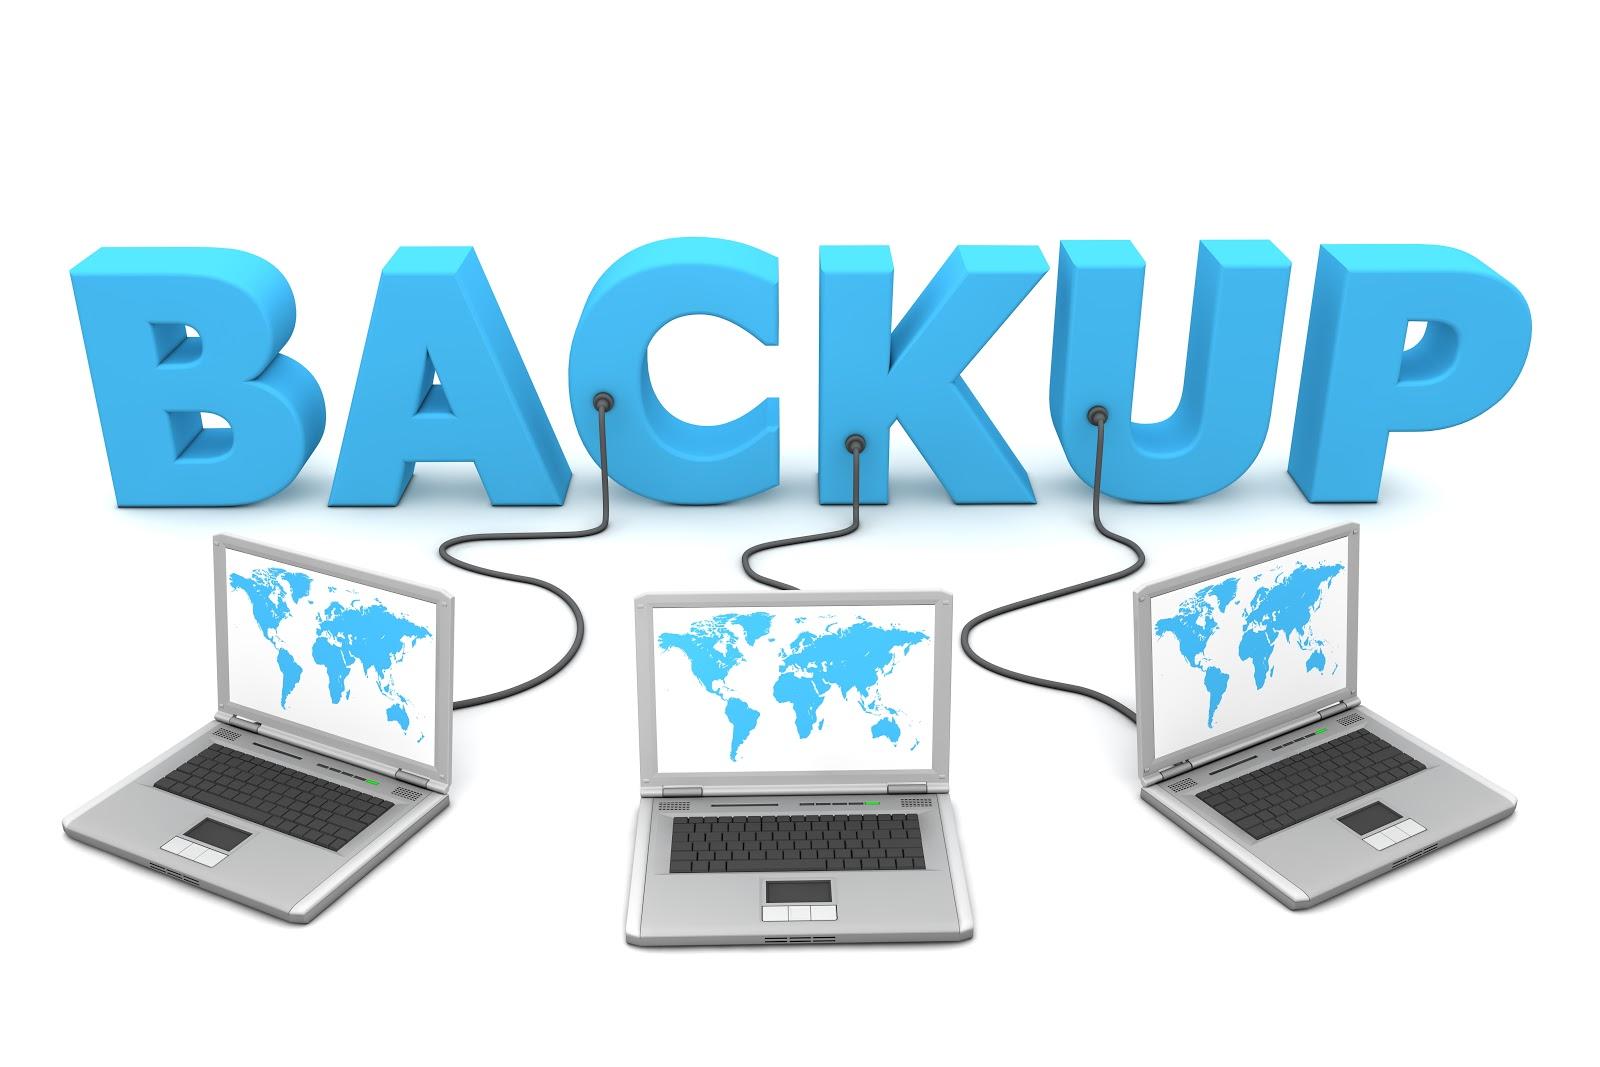 http://woodsrecruiting.com/wp-content/uploads/2014/04/Backup.jpg